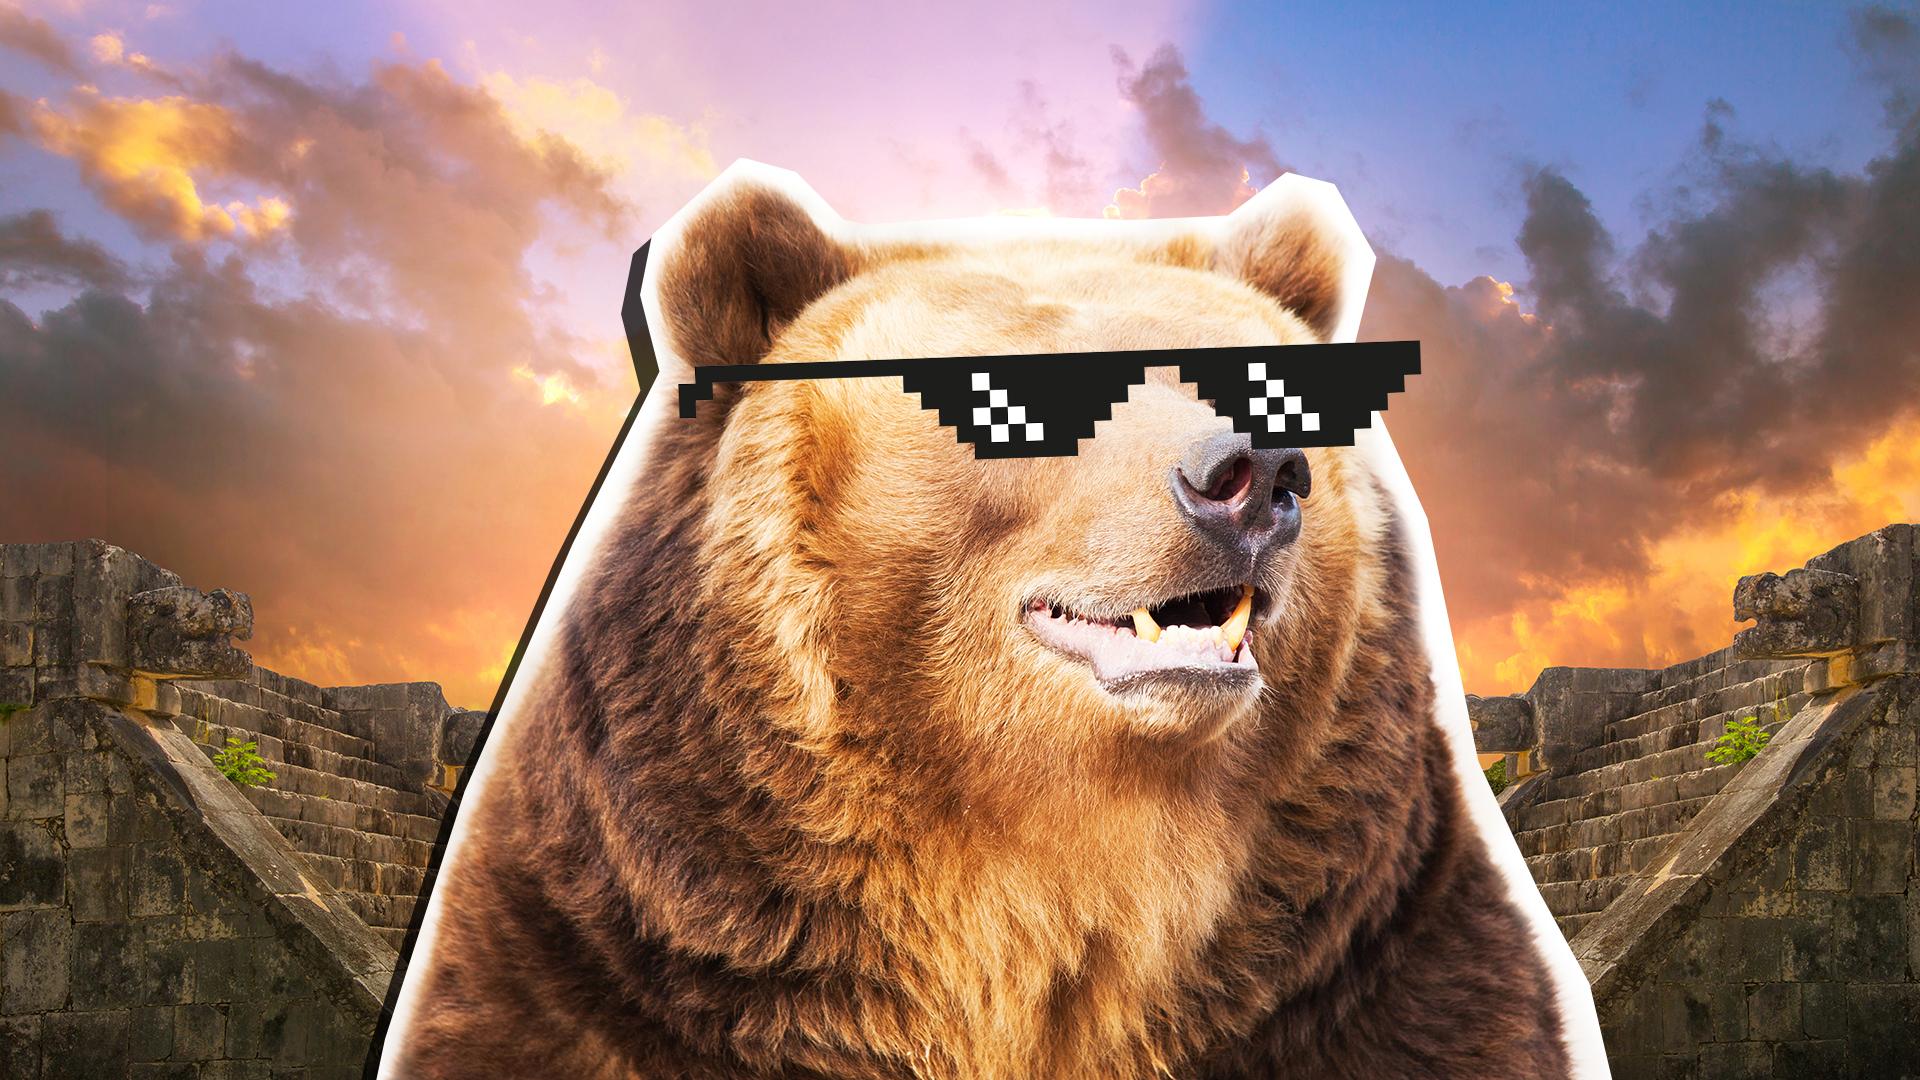 A brown bear wearing sunglasses